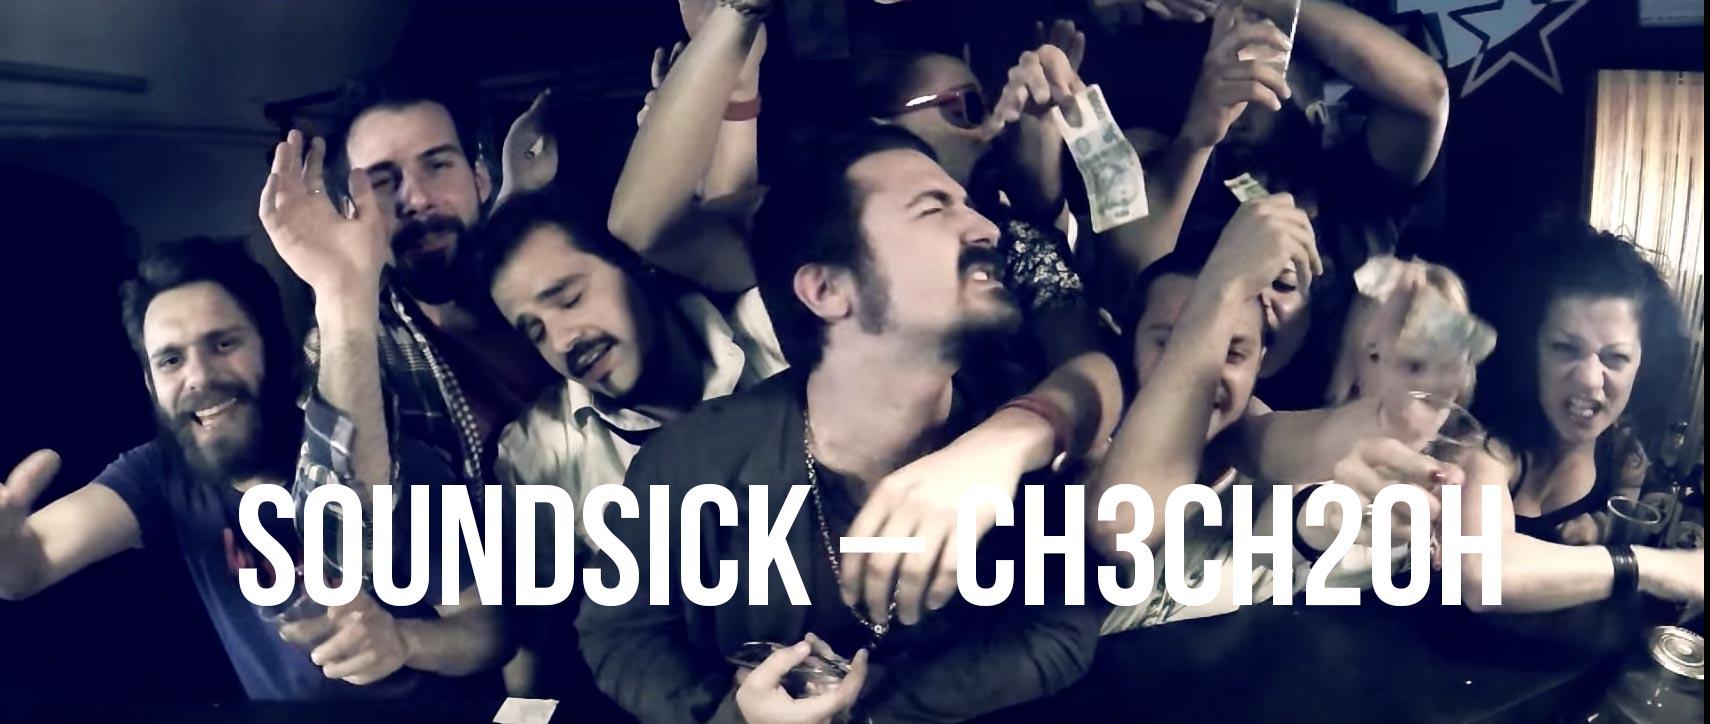 Soundsick - CH3CH2OH